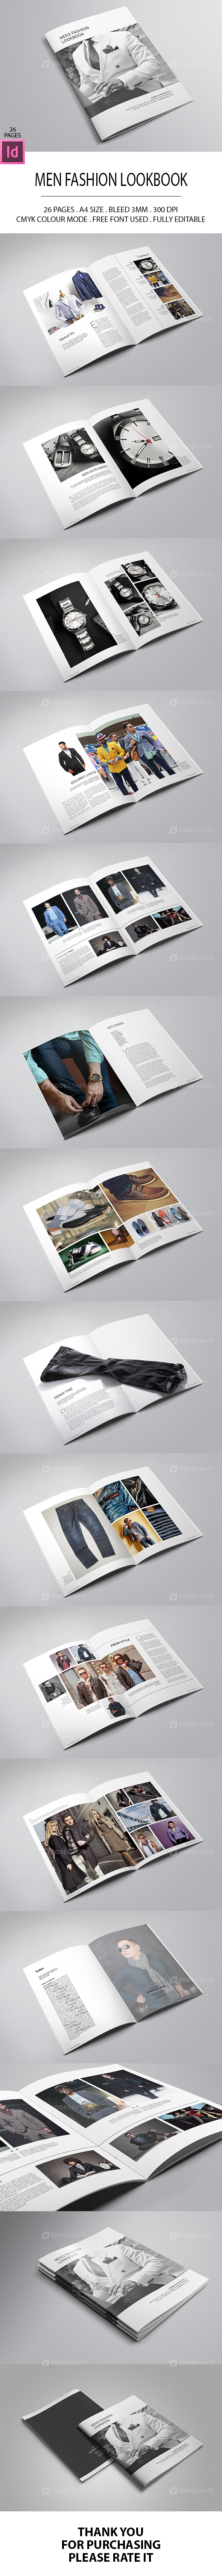 Men Fashion Lookbook